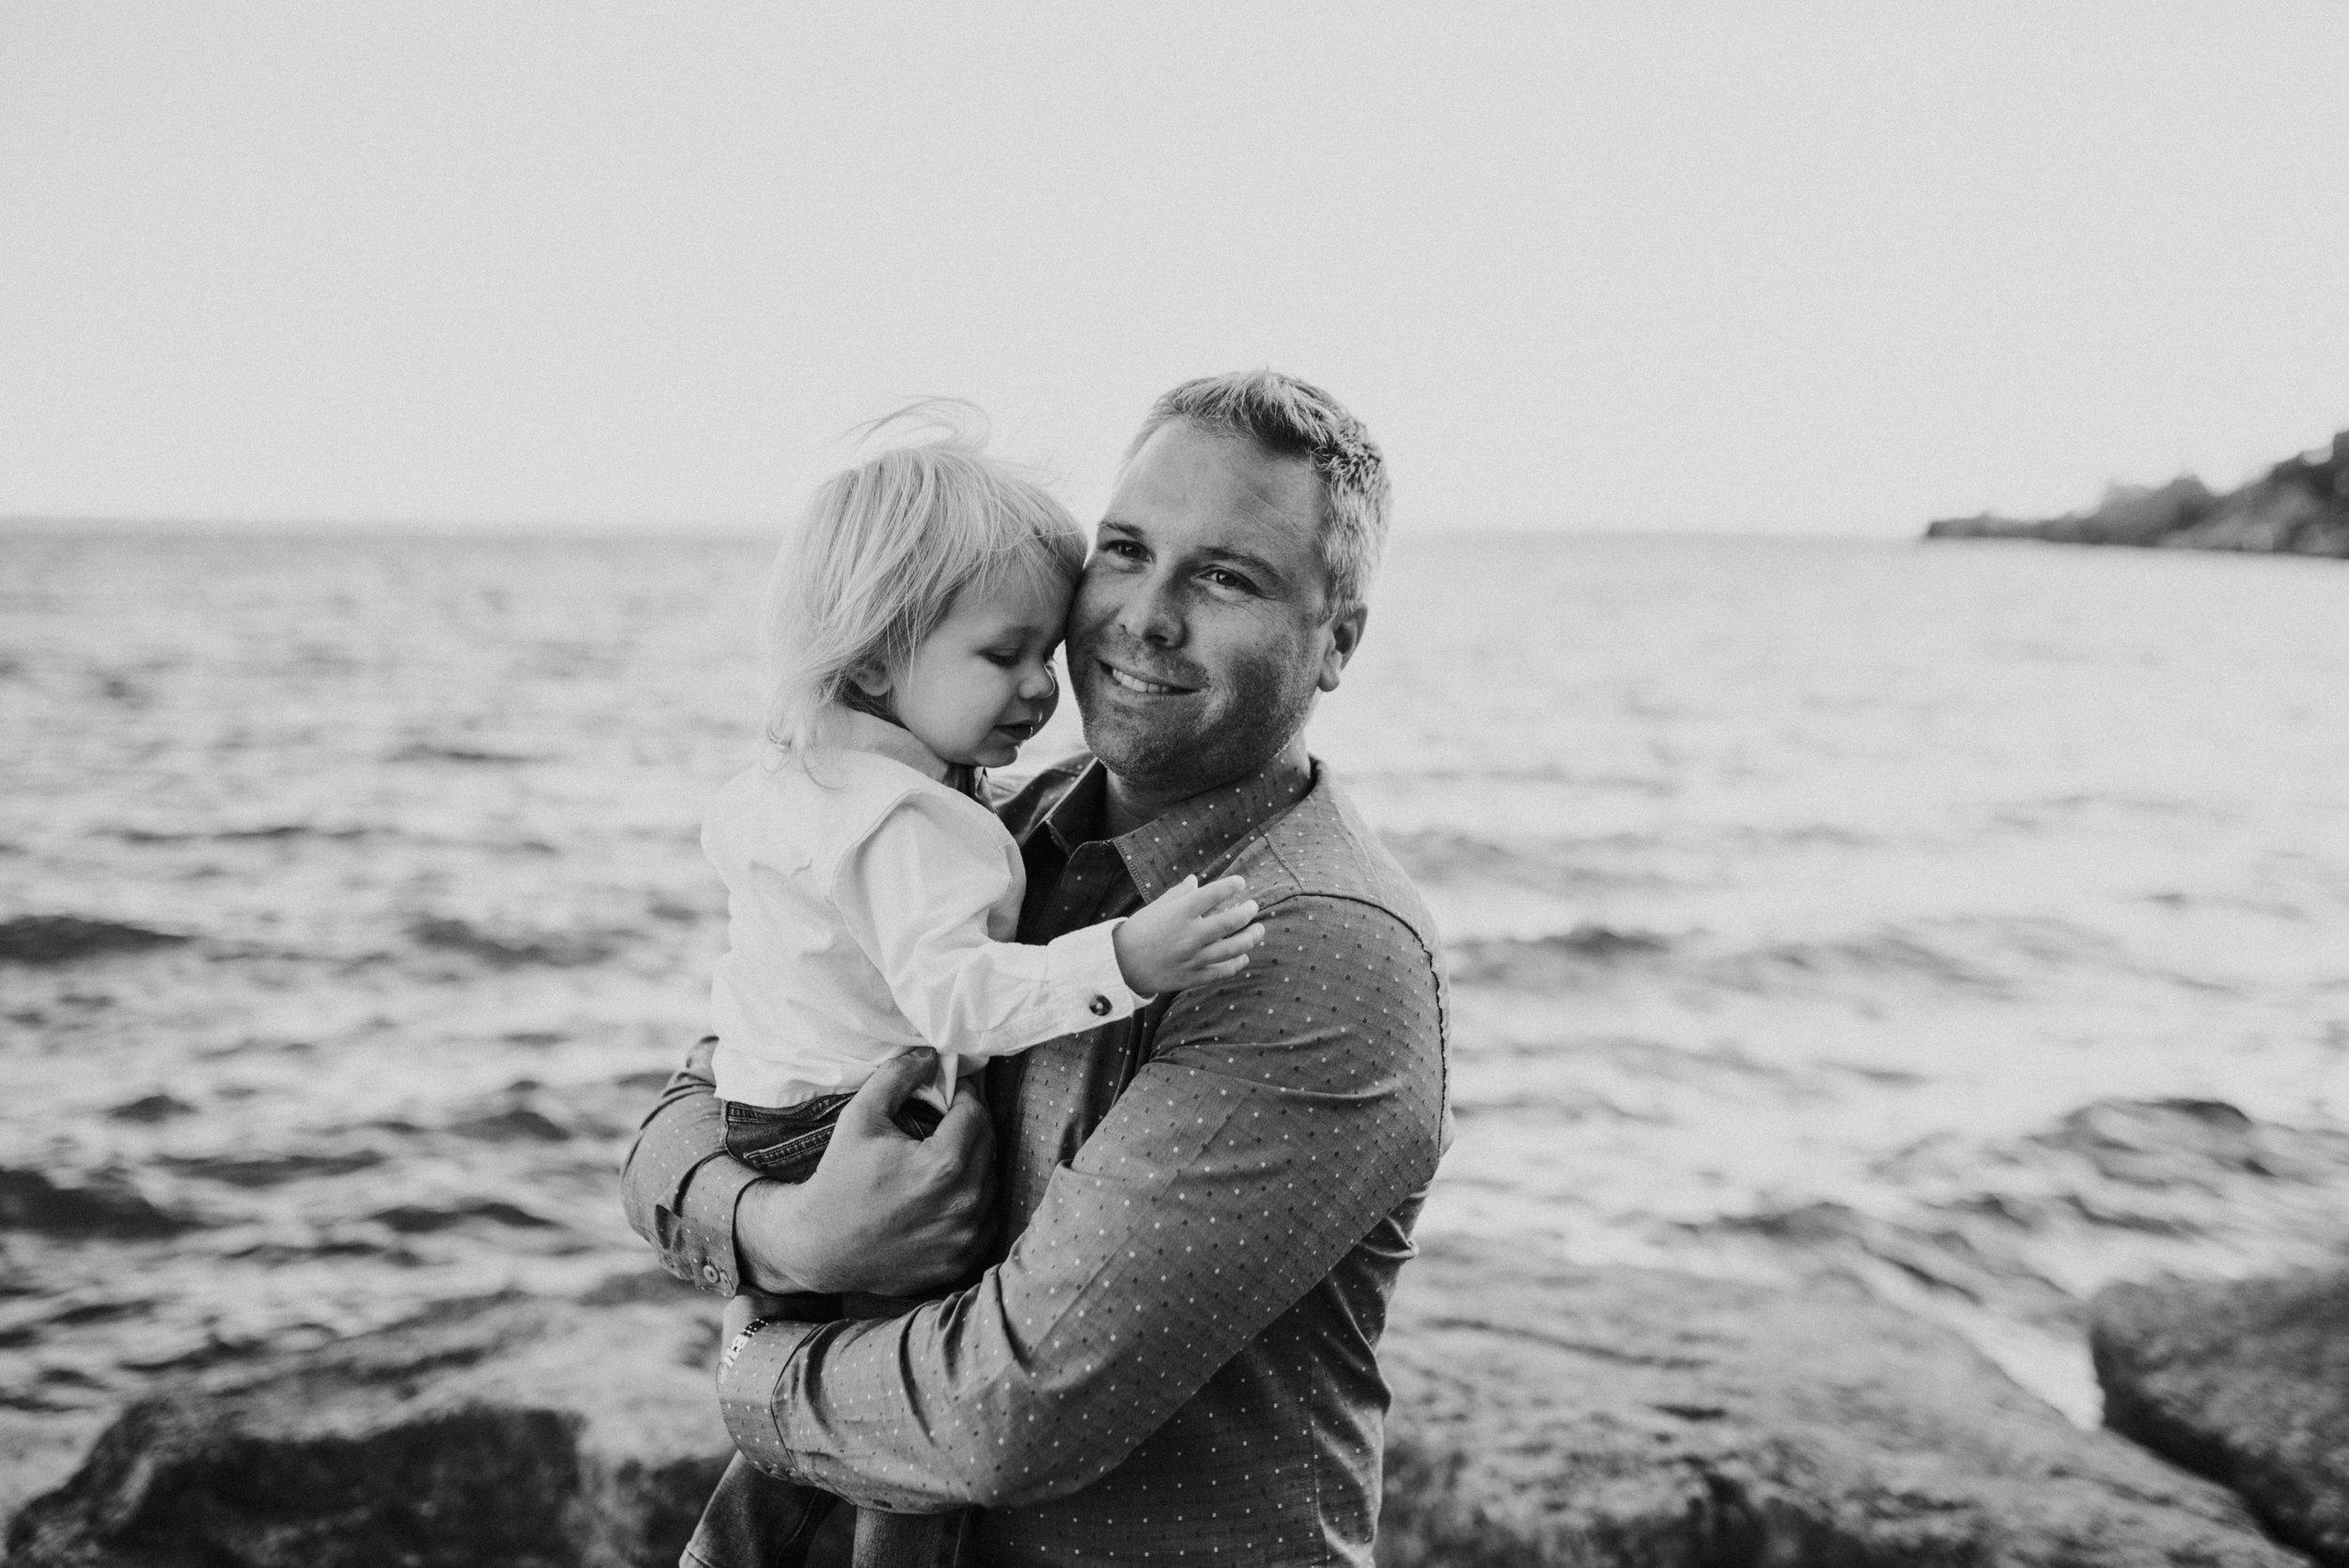 Family-Session-the-lake-blanket-family-photography-Burlington-Beamsville-Grimsby-Hamilton-lifestyle-photographer